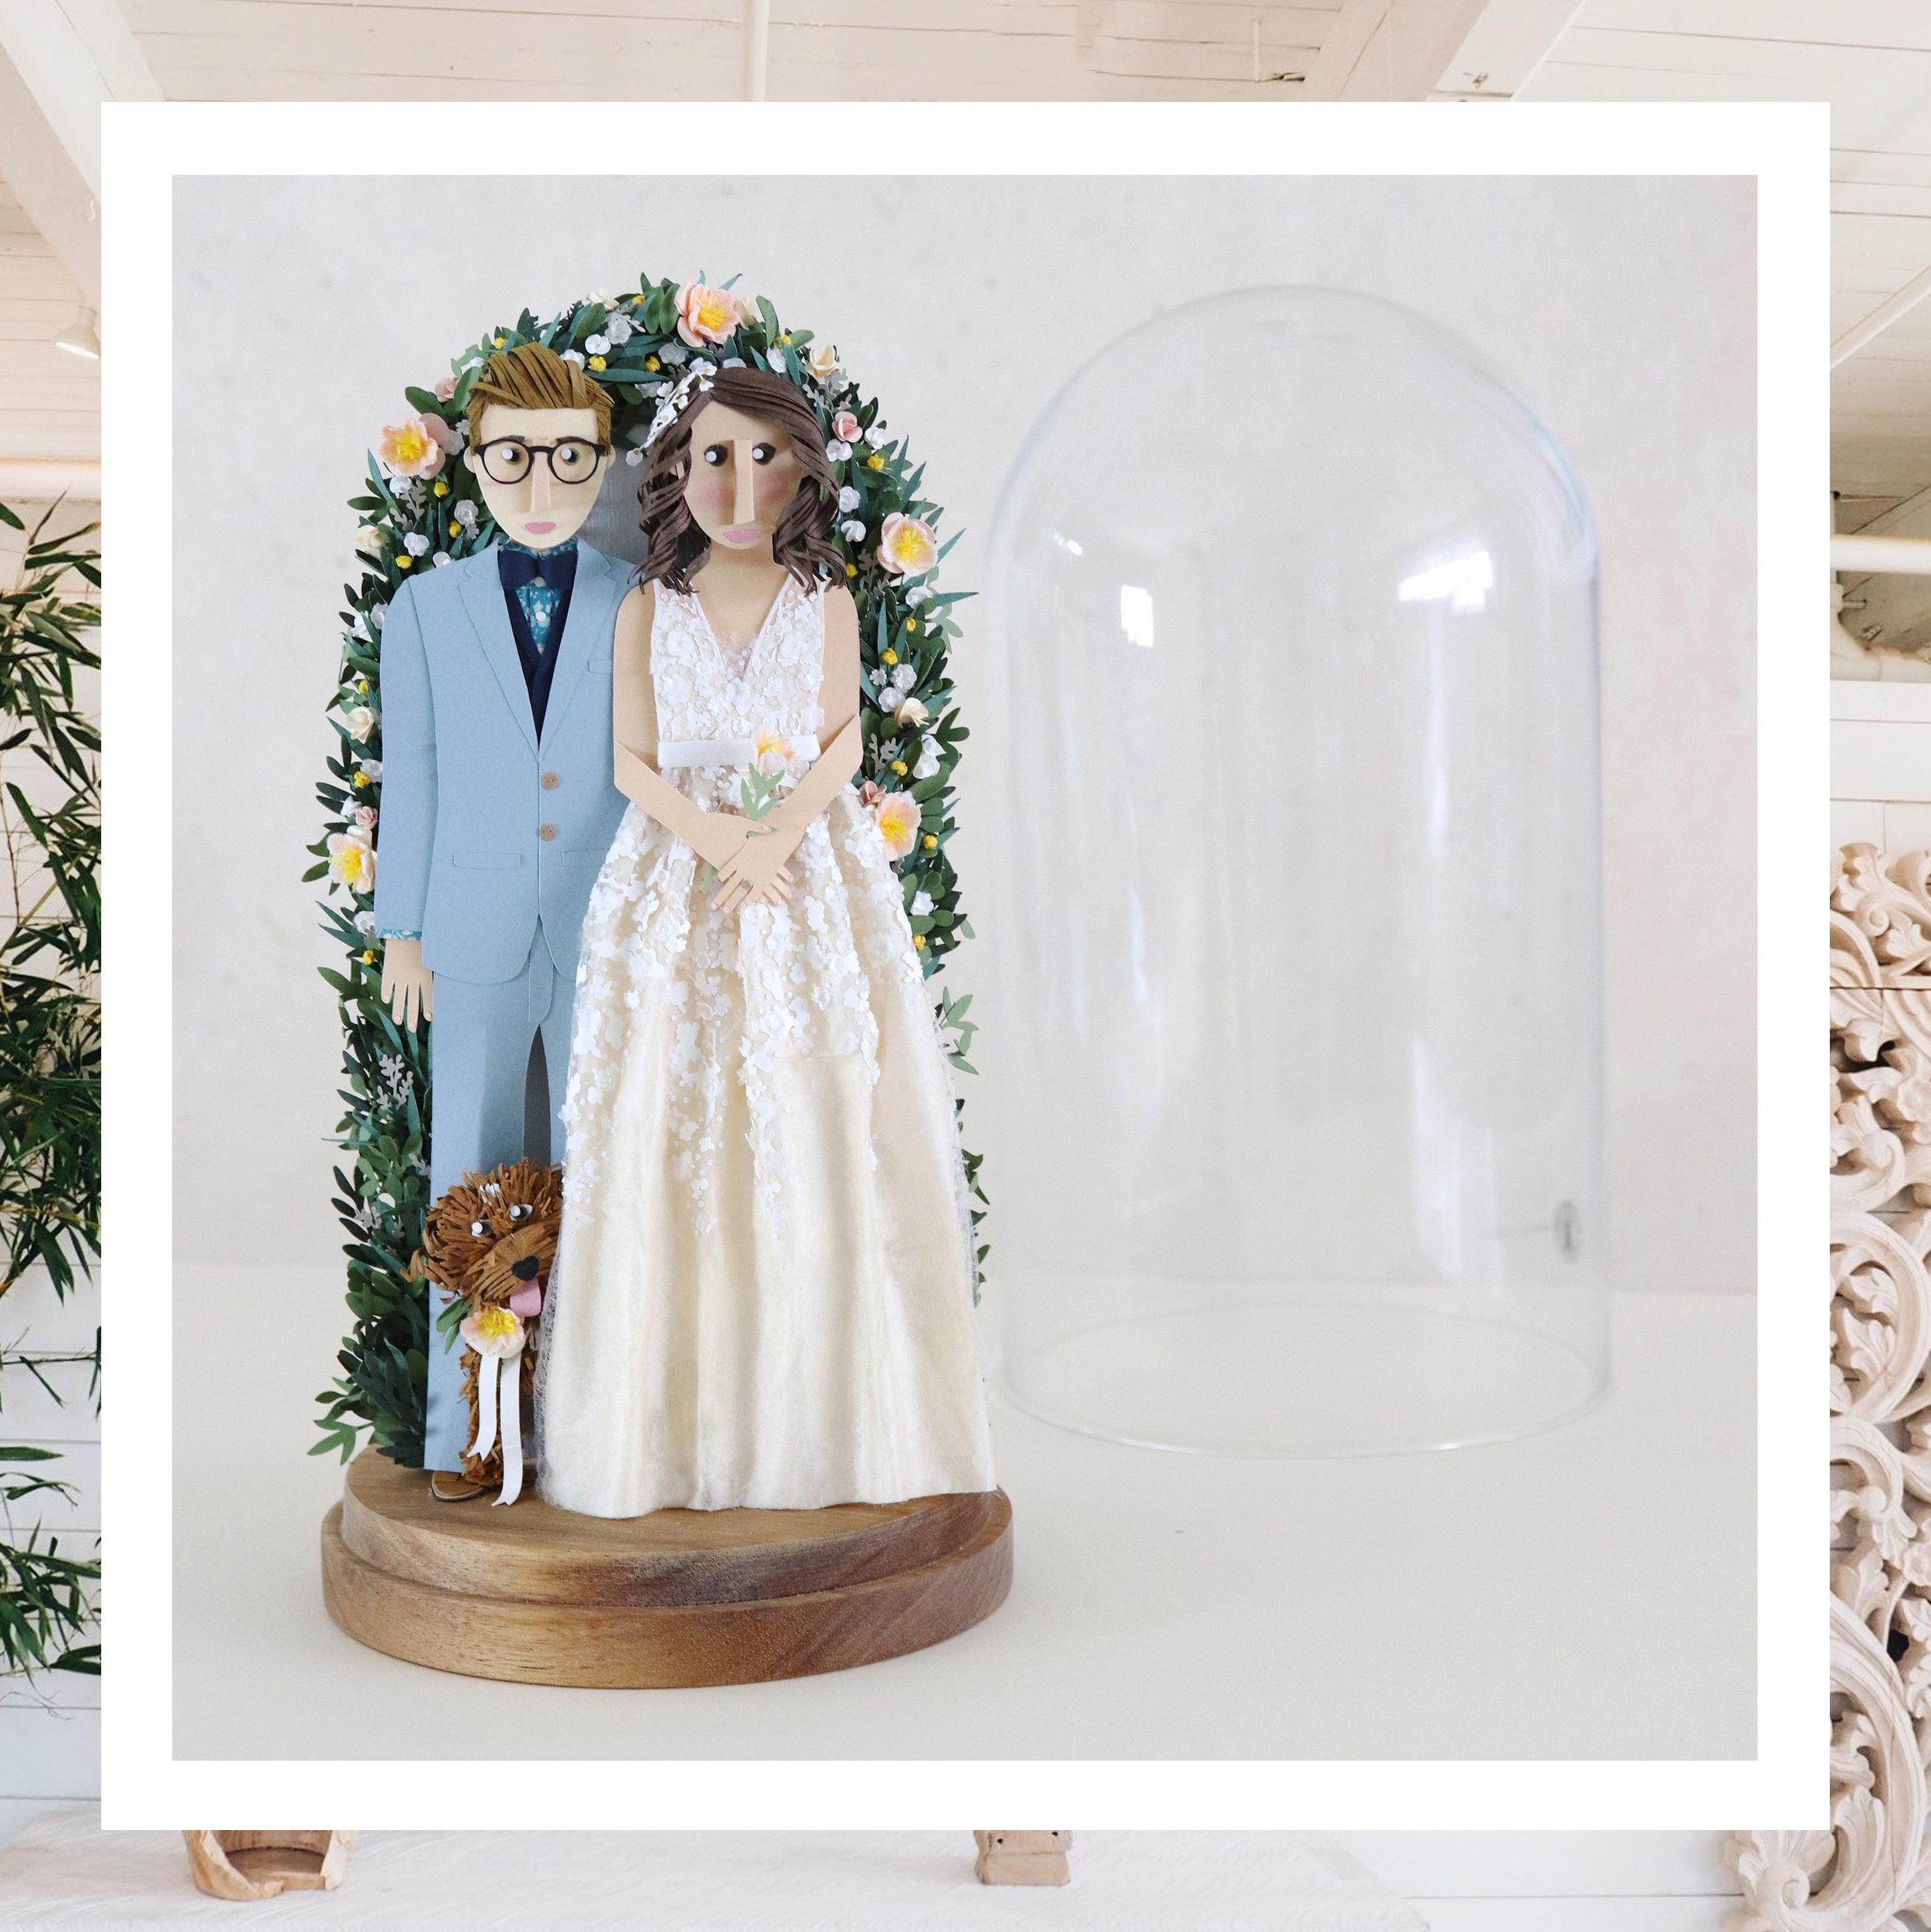 - Display Glass Dome Portrait